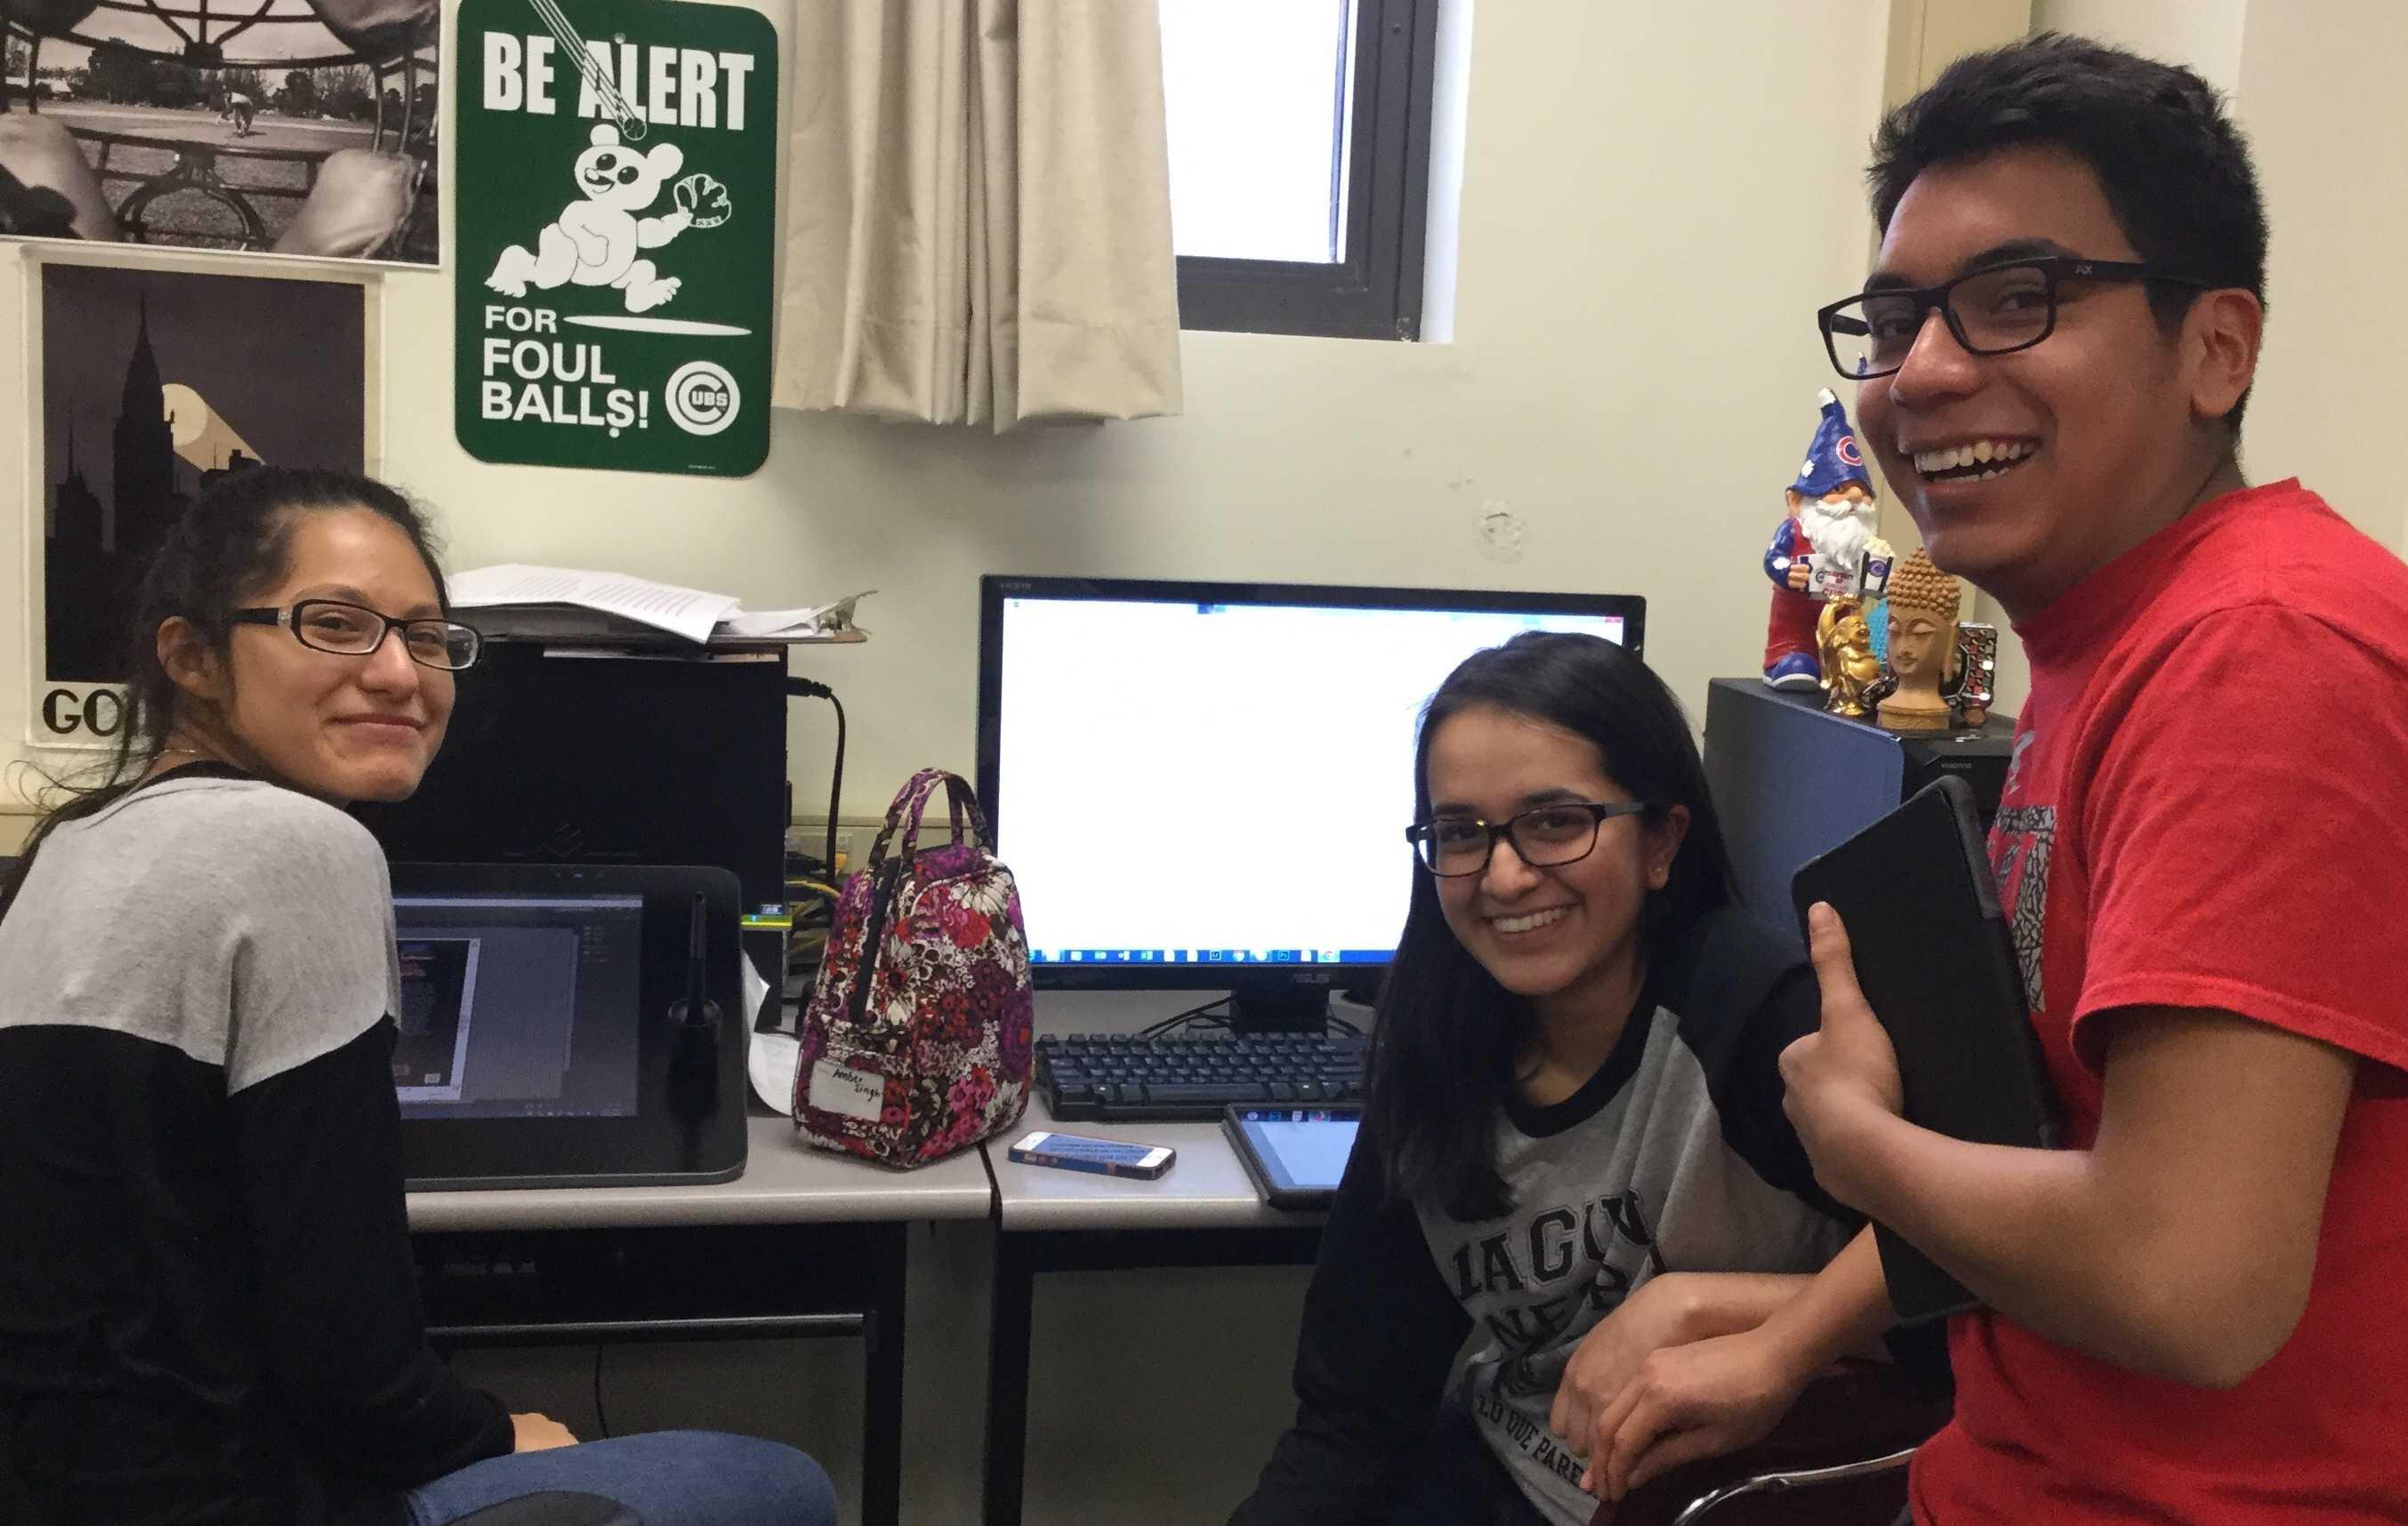 Freshman Adrian Salguero, junior Amber Singh, and senior Raquel Garcia gather together for a yearbook meeting.